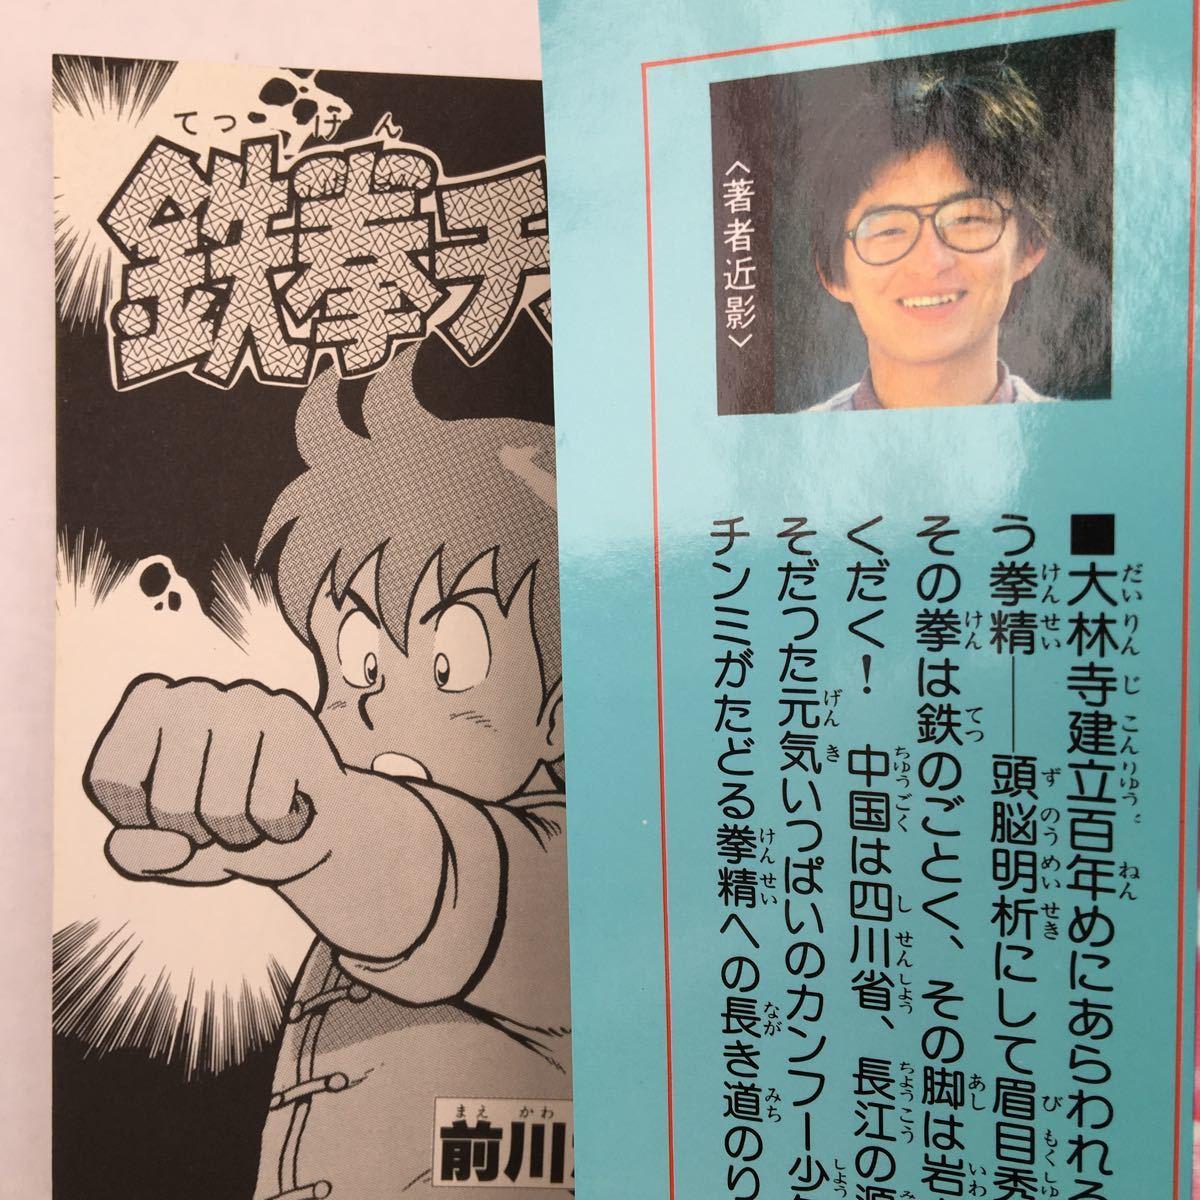 zaa-my03★鉄拳チンミ 全19巻 前川たけし (著) 中古コミック 漫画 マンガ 全巻セット 1985/7/20